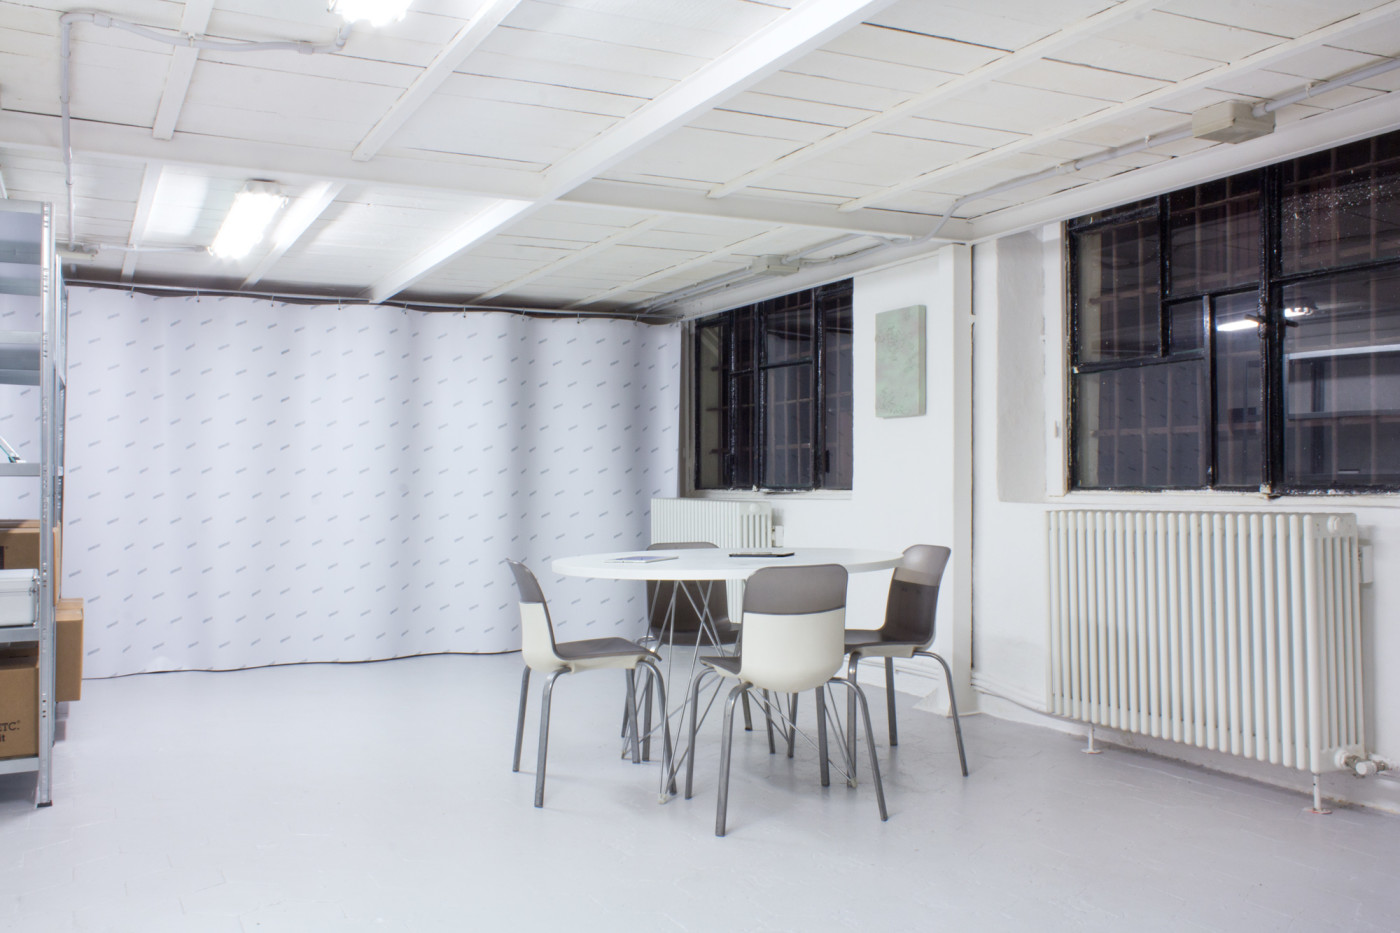 bb5000studio_corazon_installation_view_2